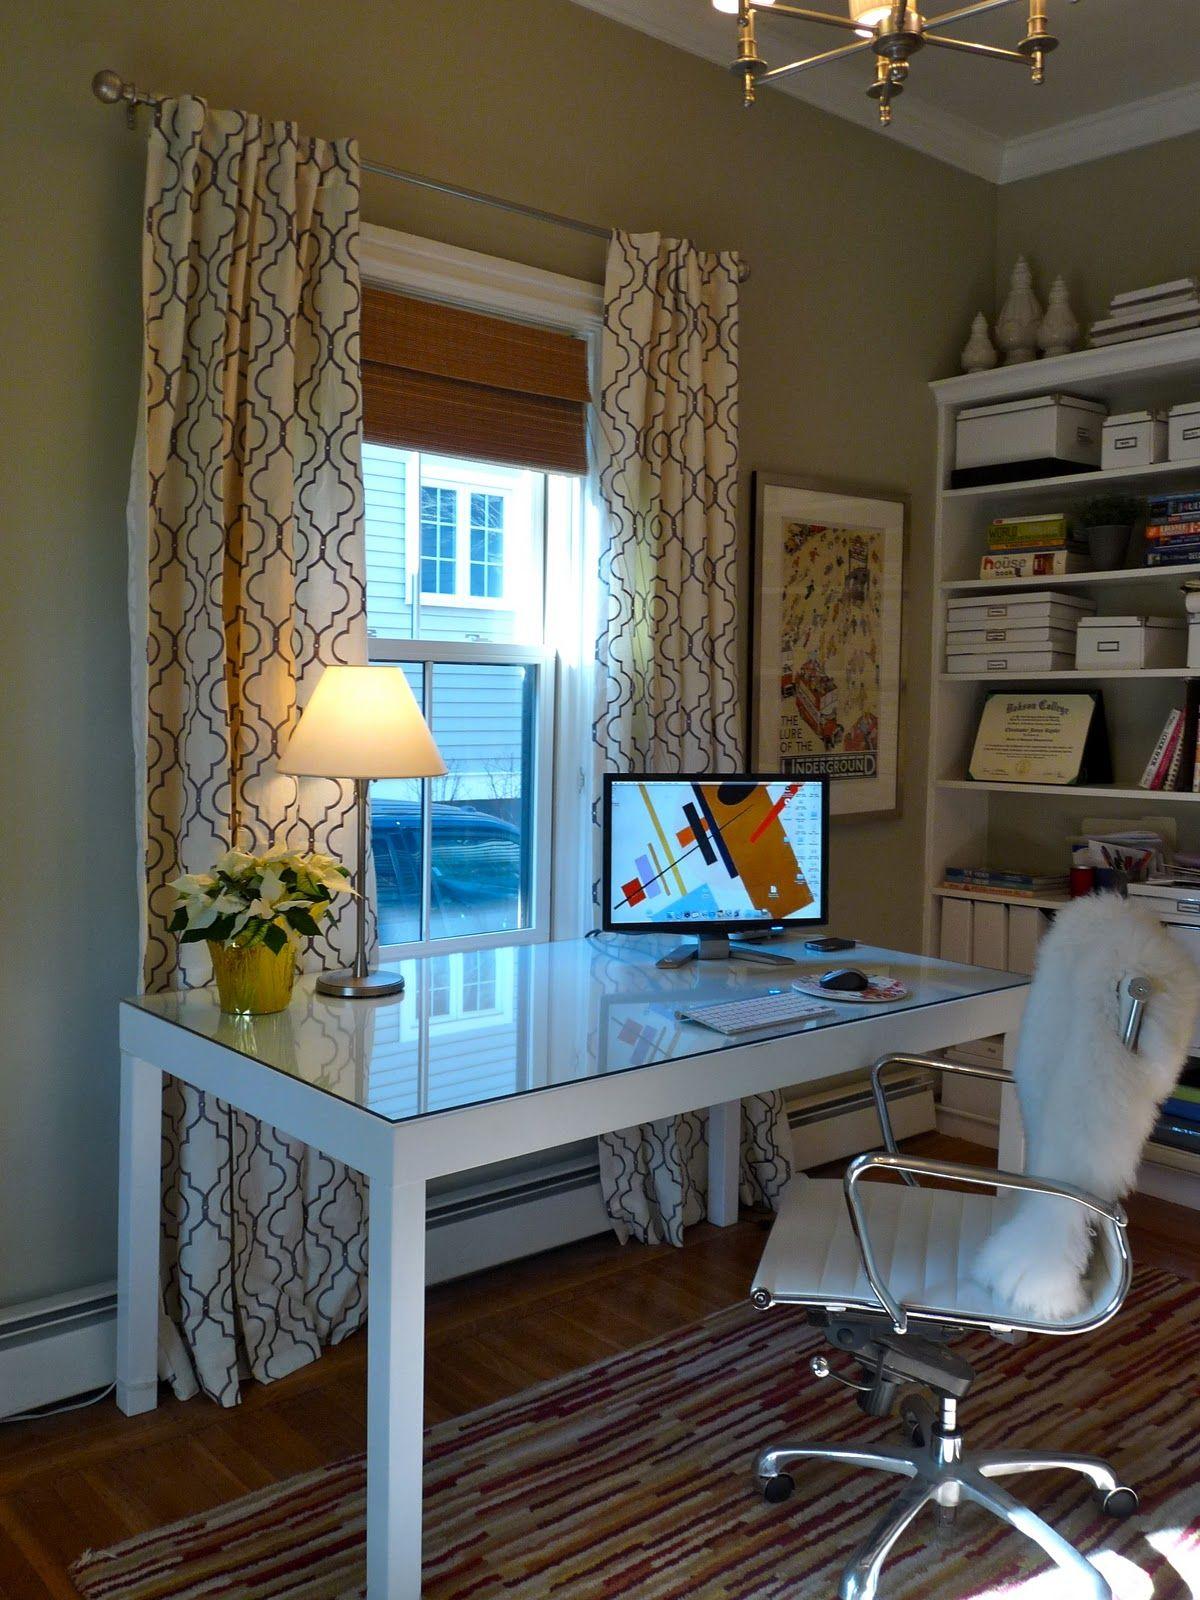 interior room exteriors design picture and interiors piano window house desk furniture free